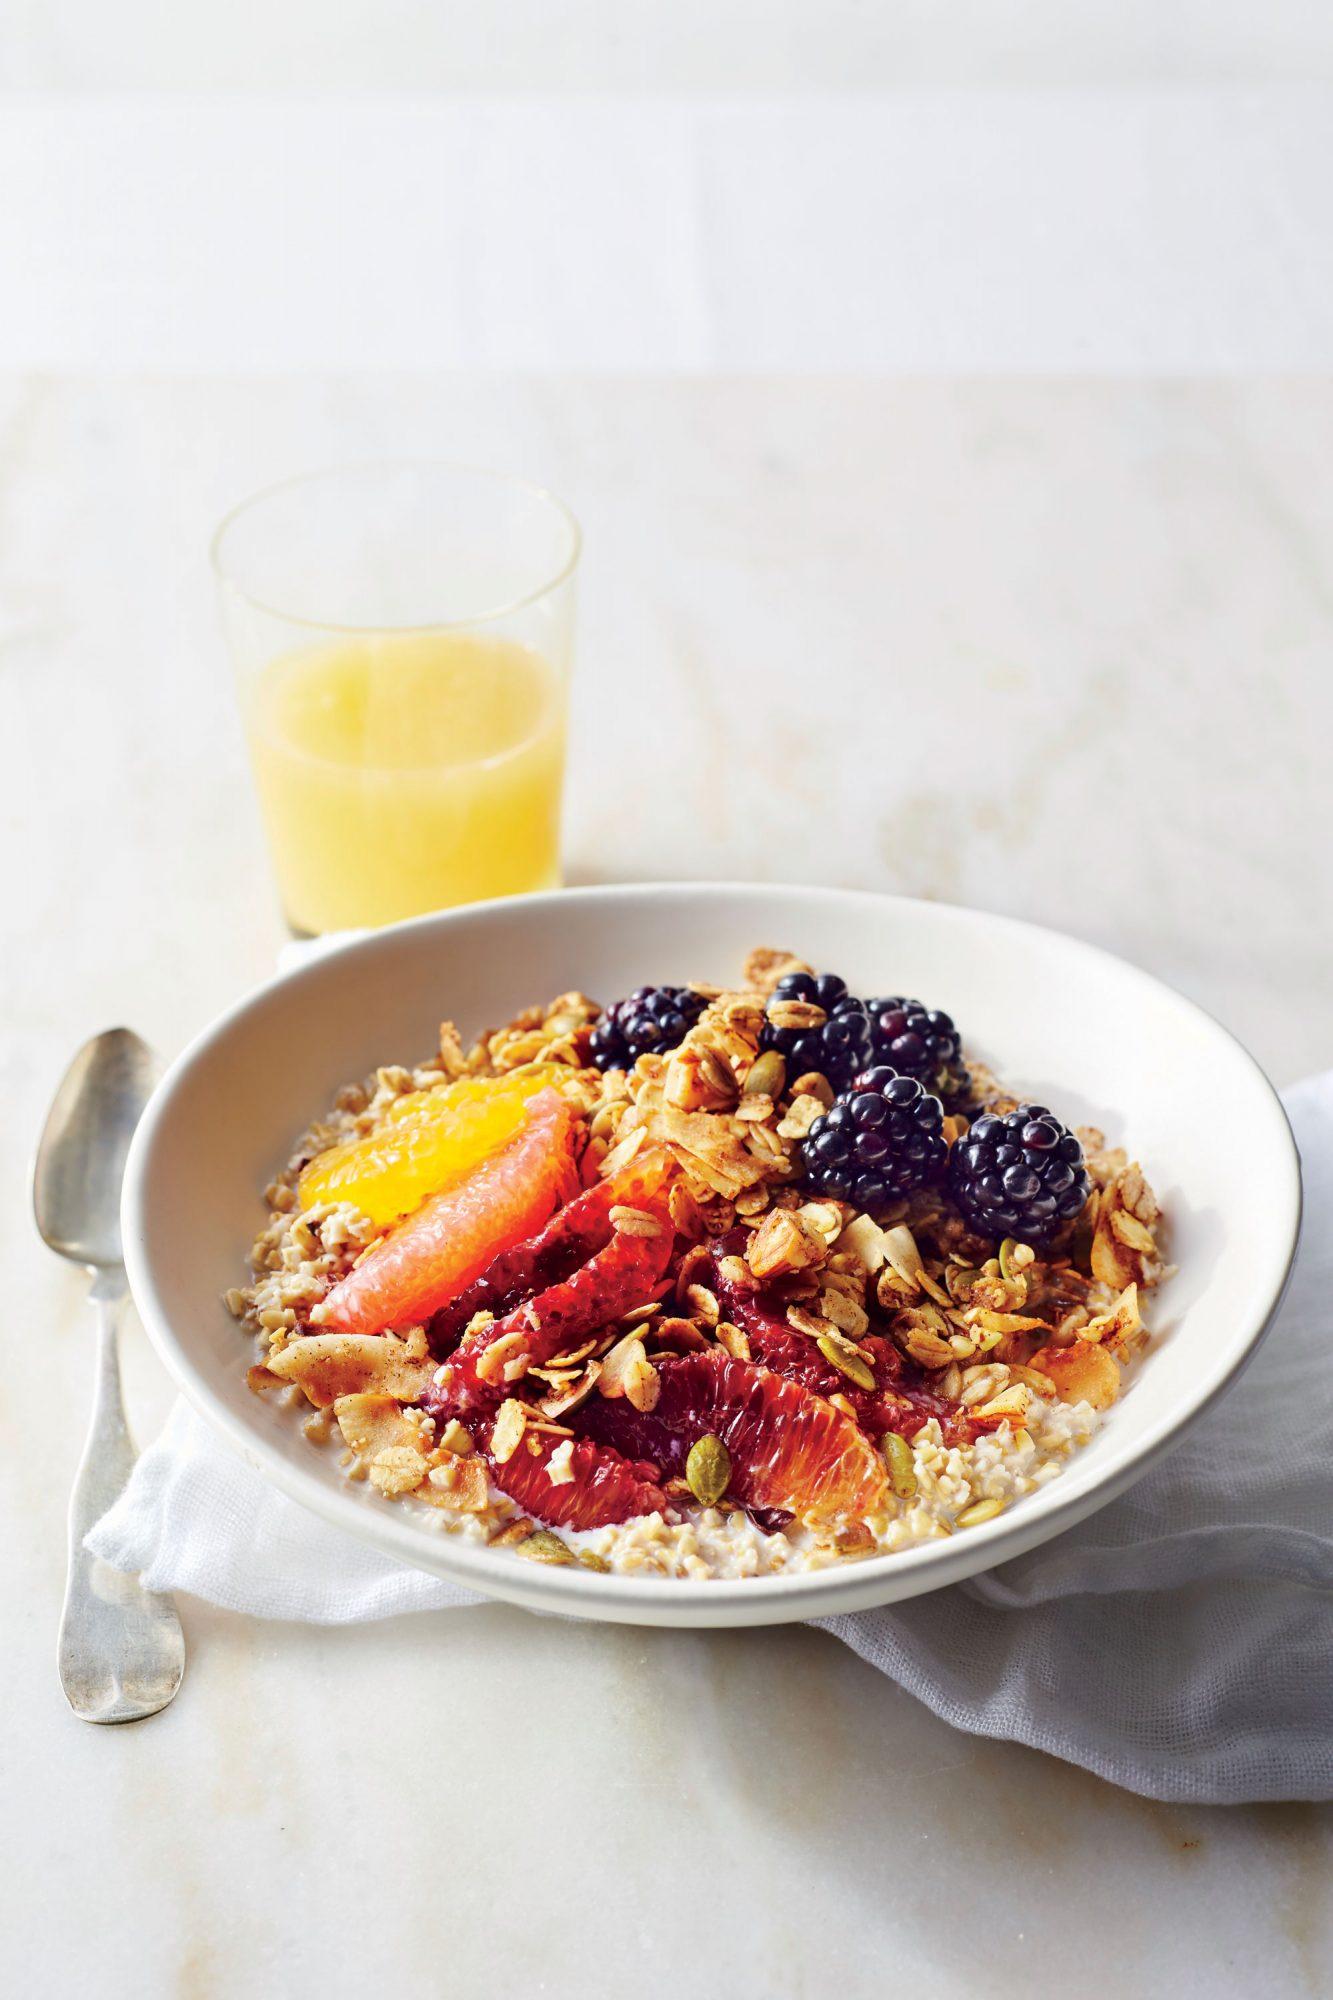 Blackberry-Citrus Granola Bowl